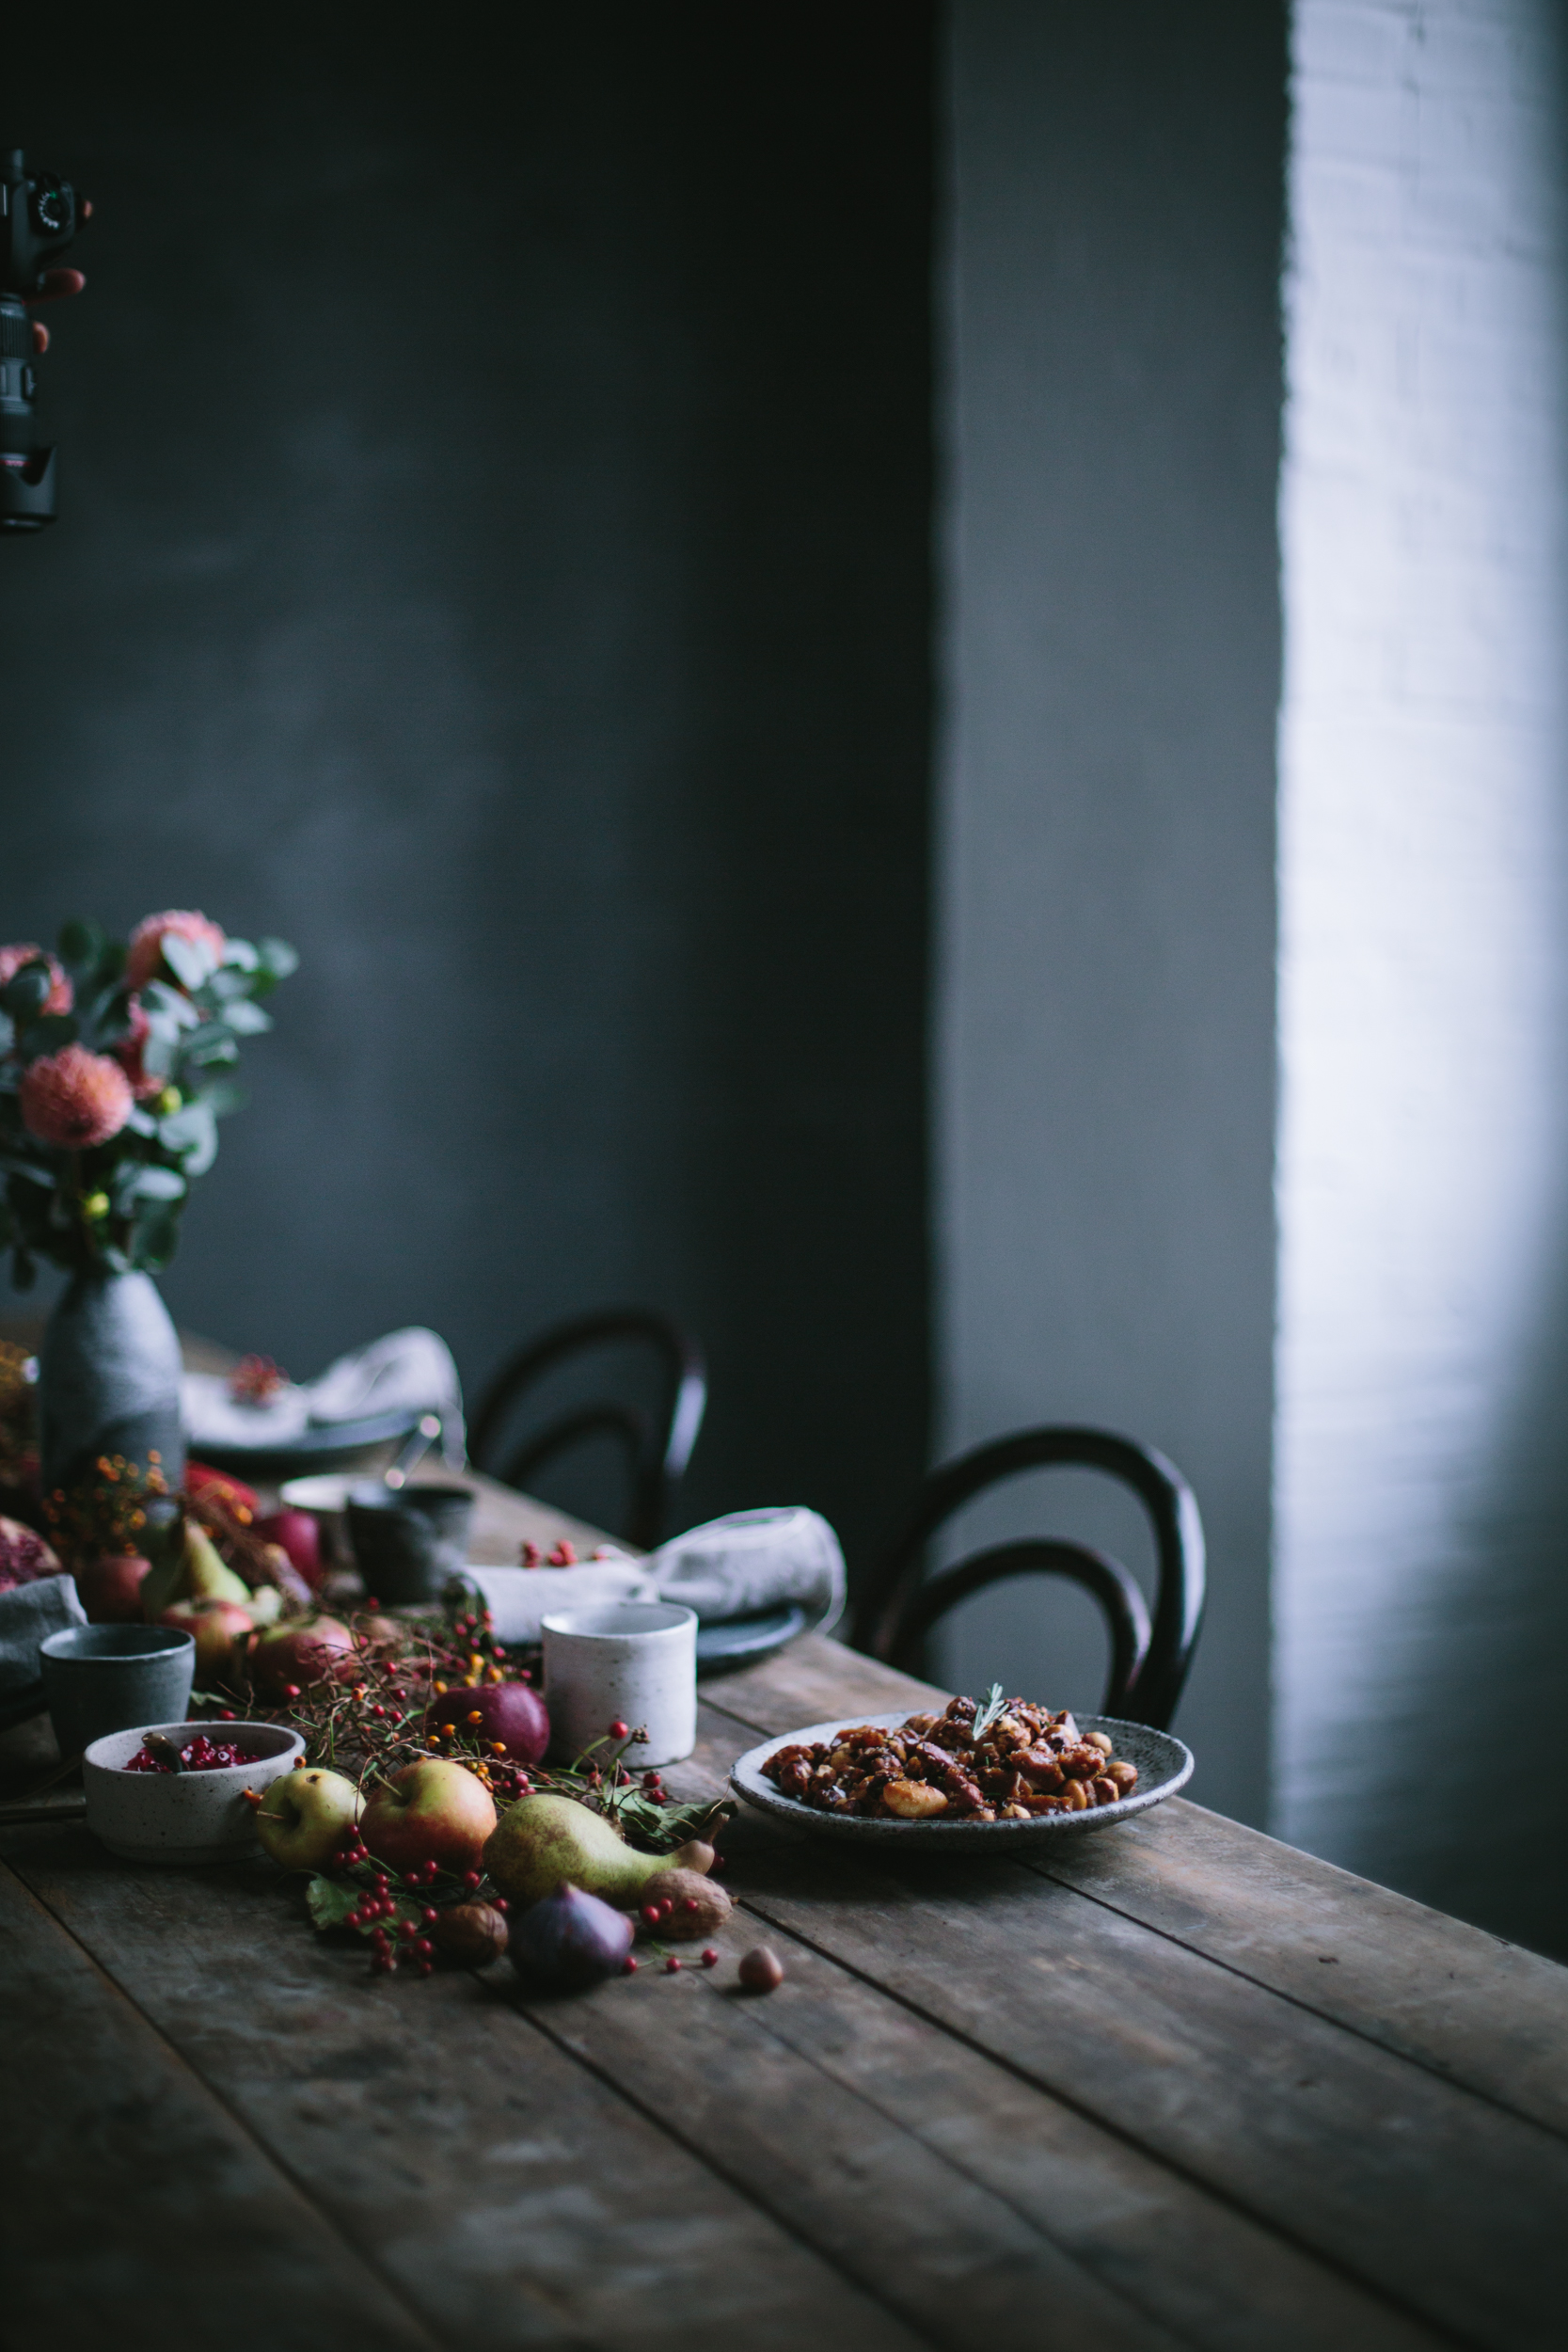 pumpkin-pancakes-by-eva-kosmas-flores-4